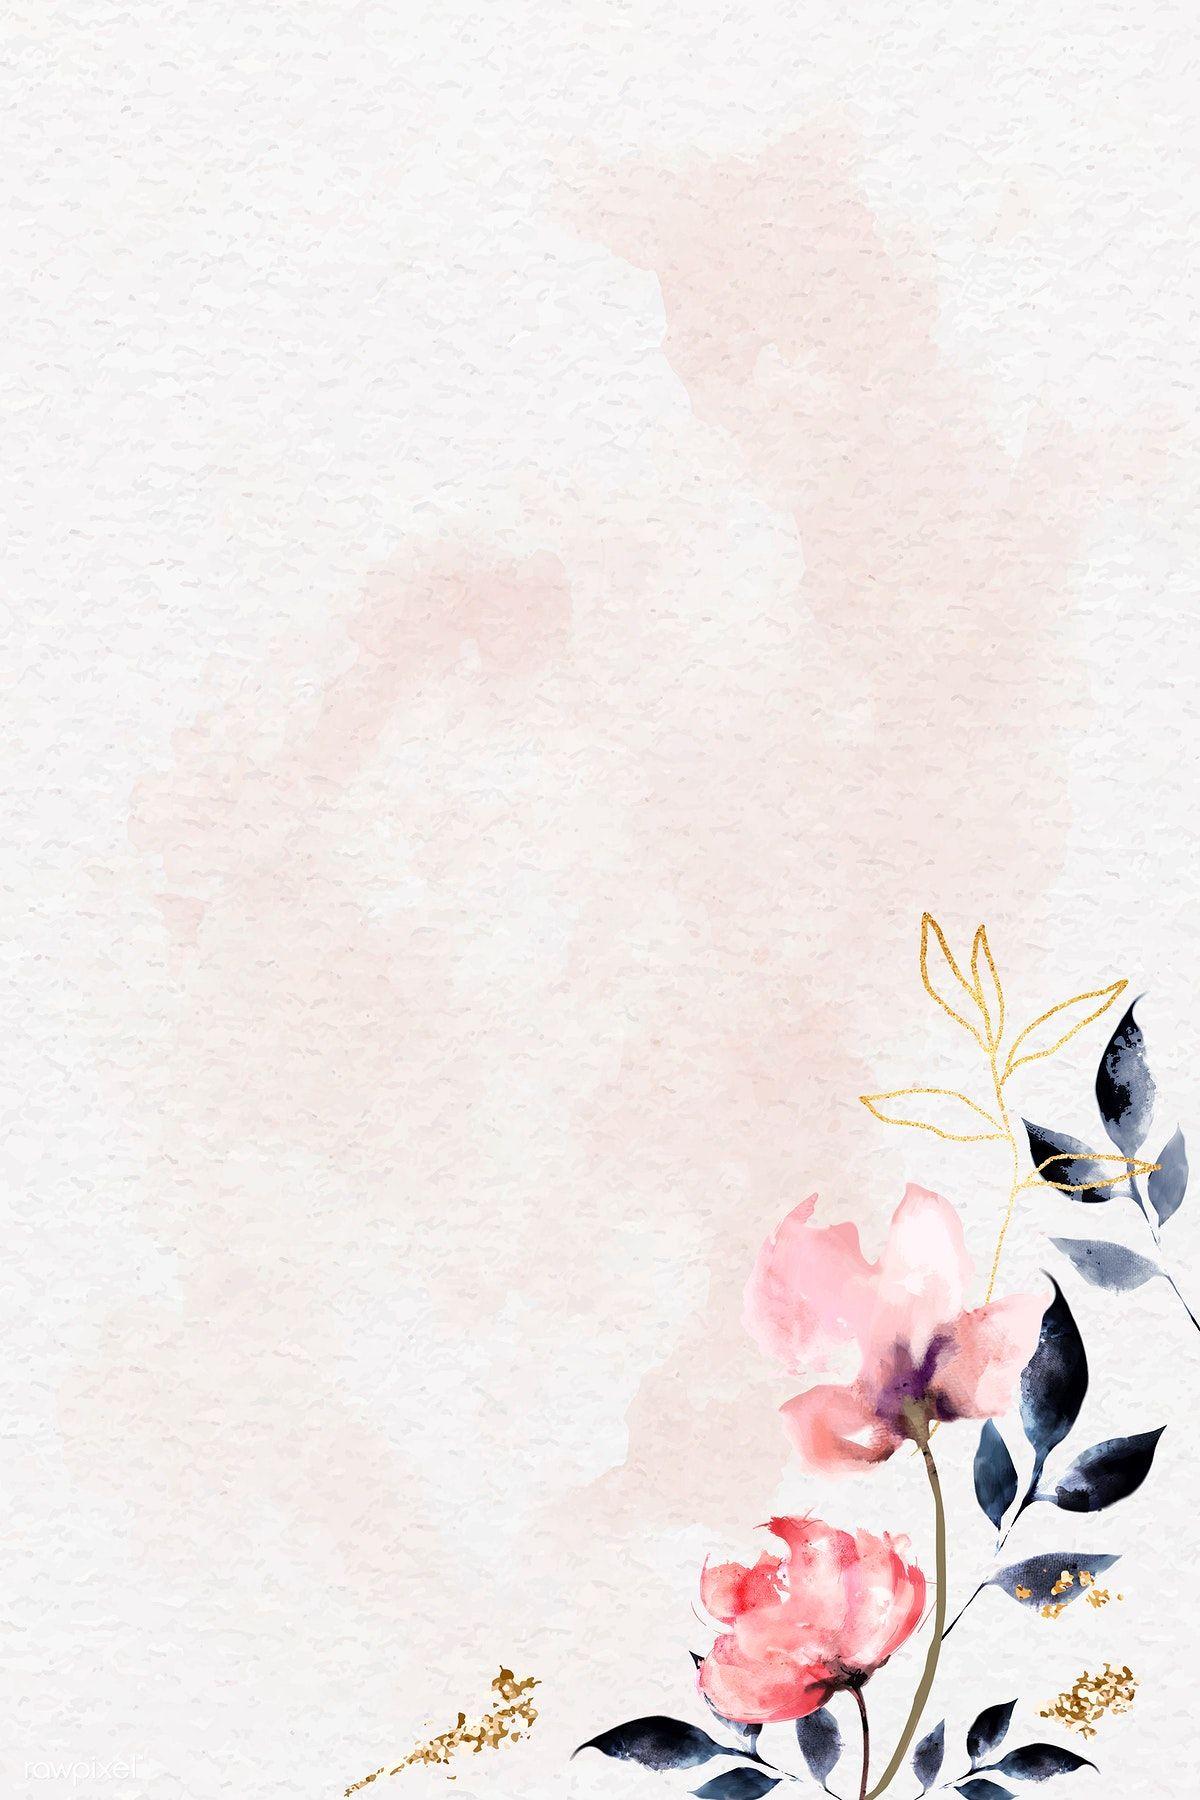 Download premium vector of Shimmering watercolor floral